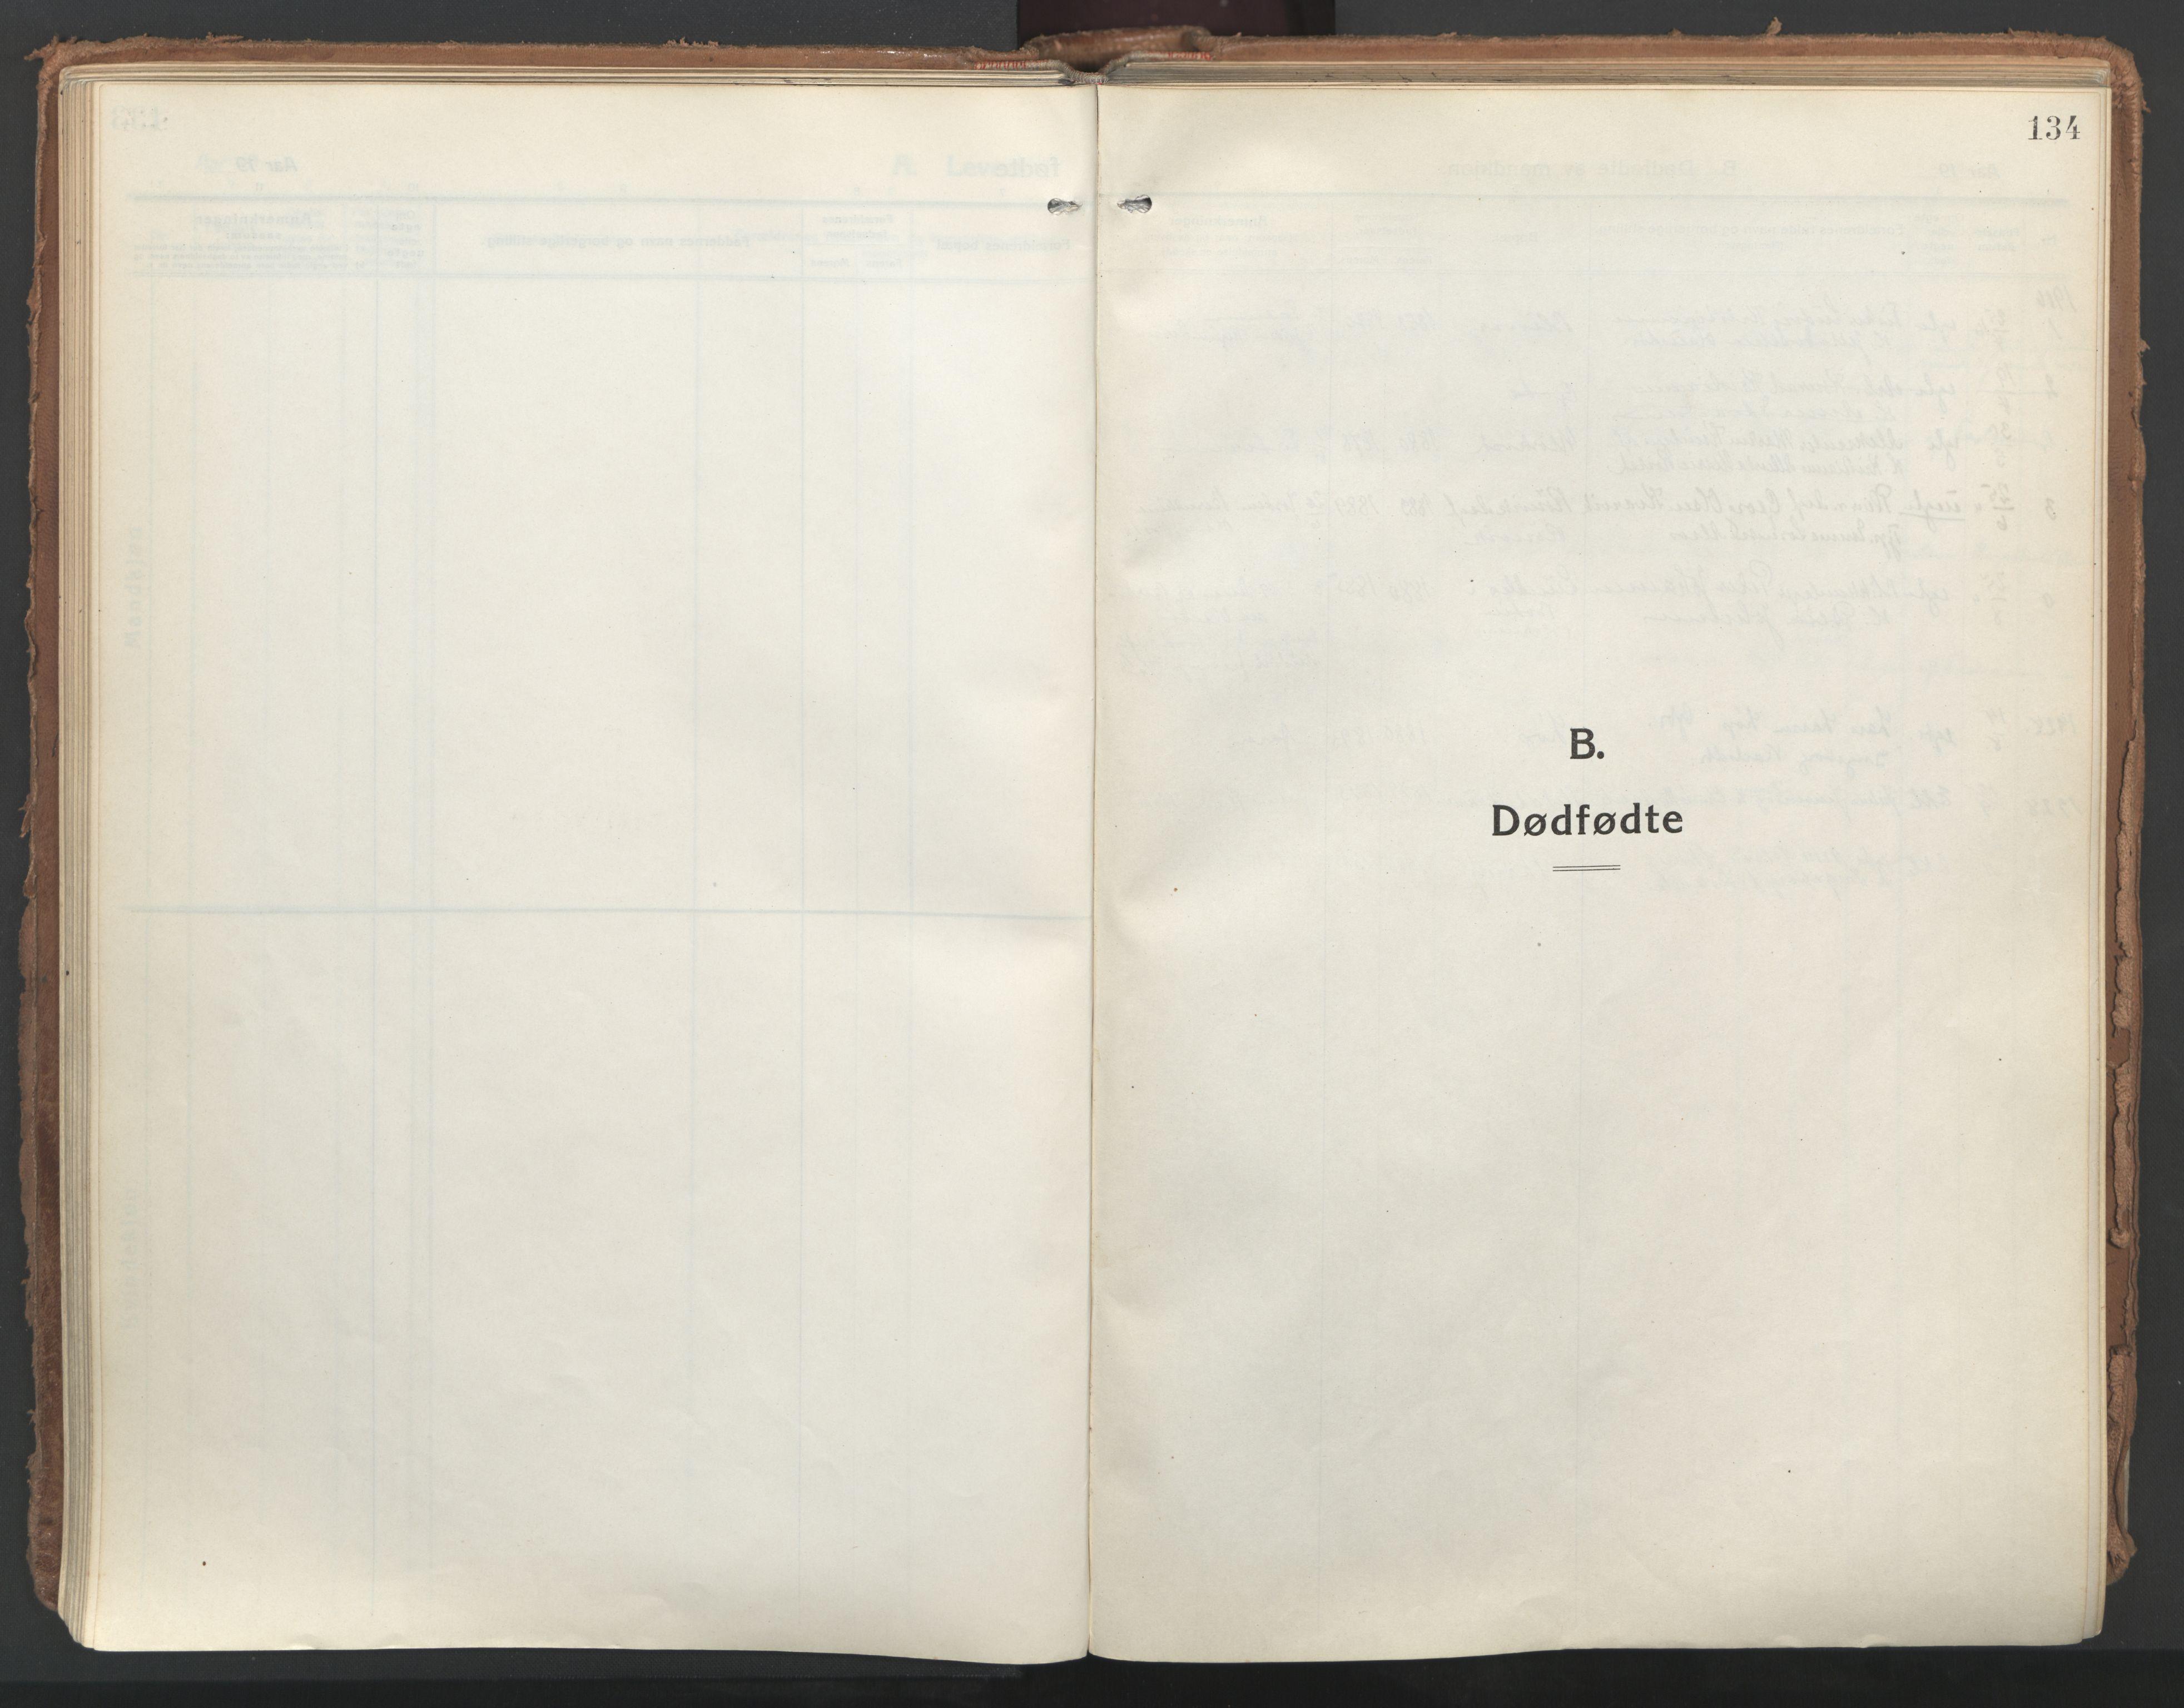 SAT, Ministerialprotokoller, klokkerbøker og fødselsregistre - Nordland, 802/L0060: Ministerialbok nr. 802A07, 1916-1933, s. 134